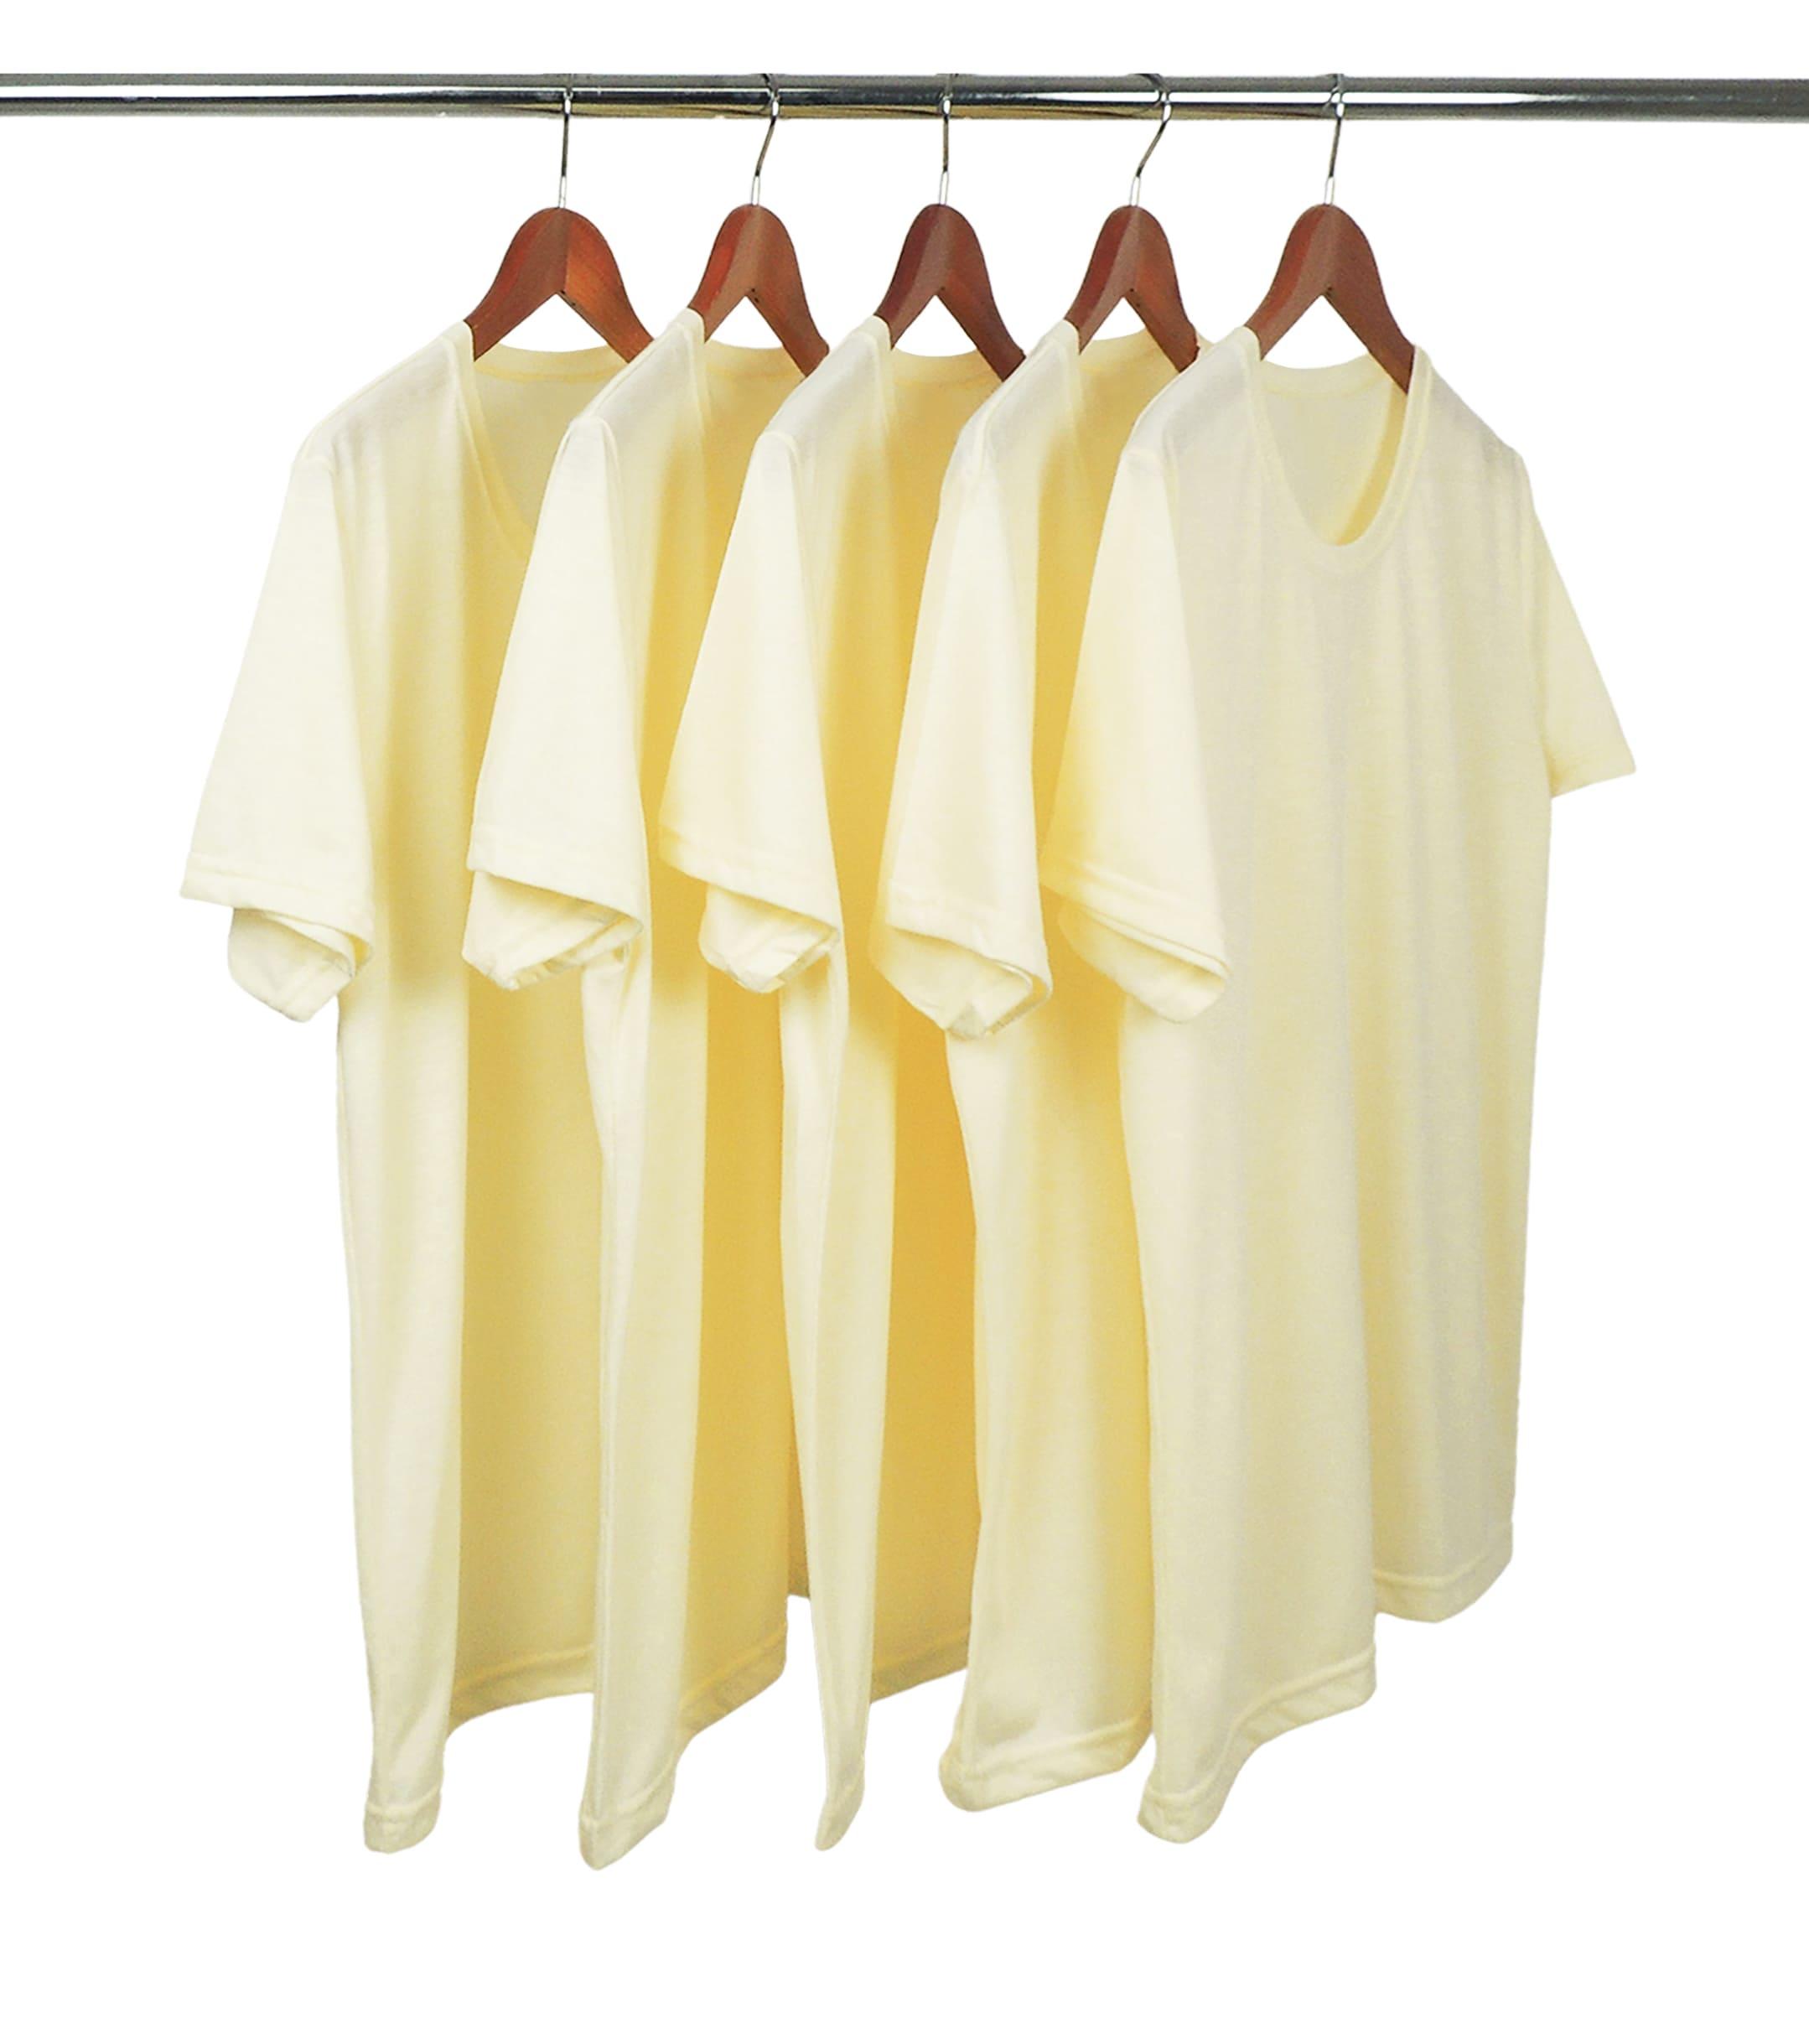 KIT 5 Camisetas de Poliéster/Sublimática Amarelo Bebê